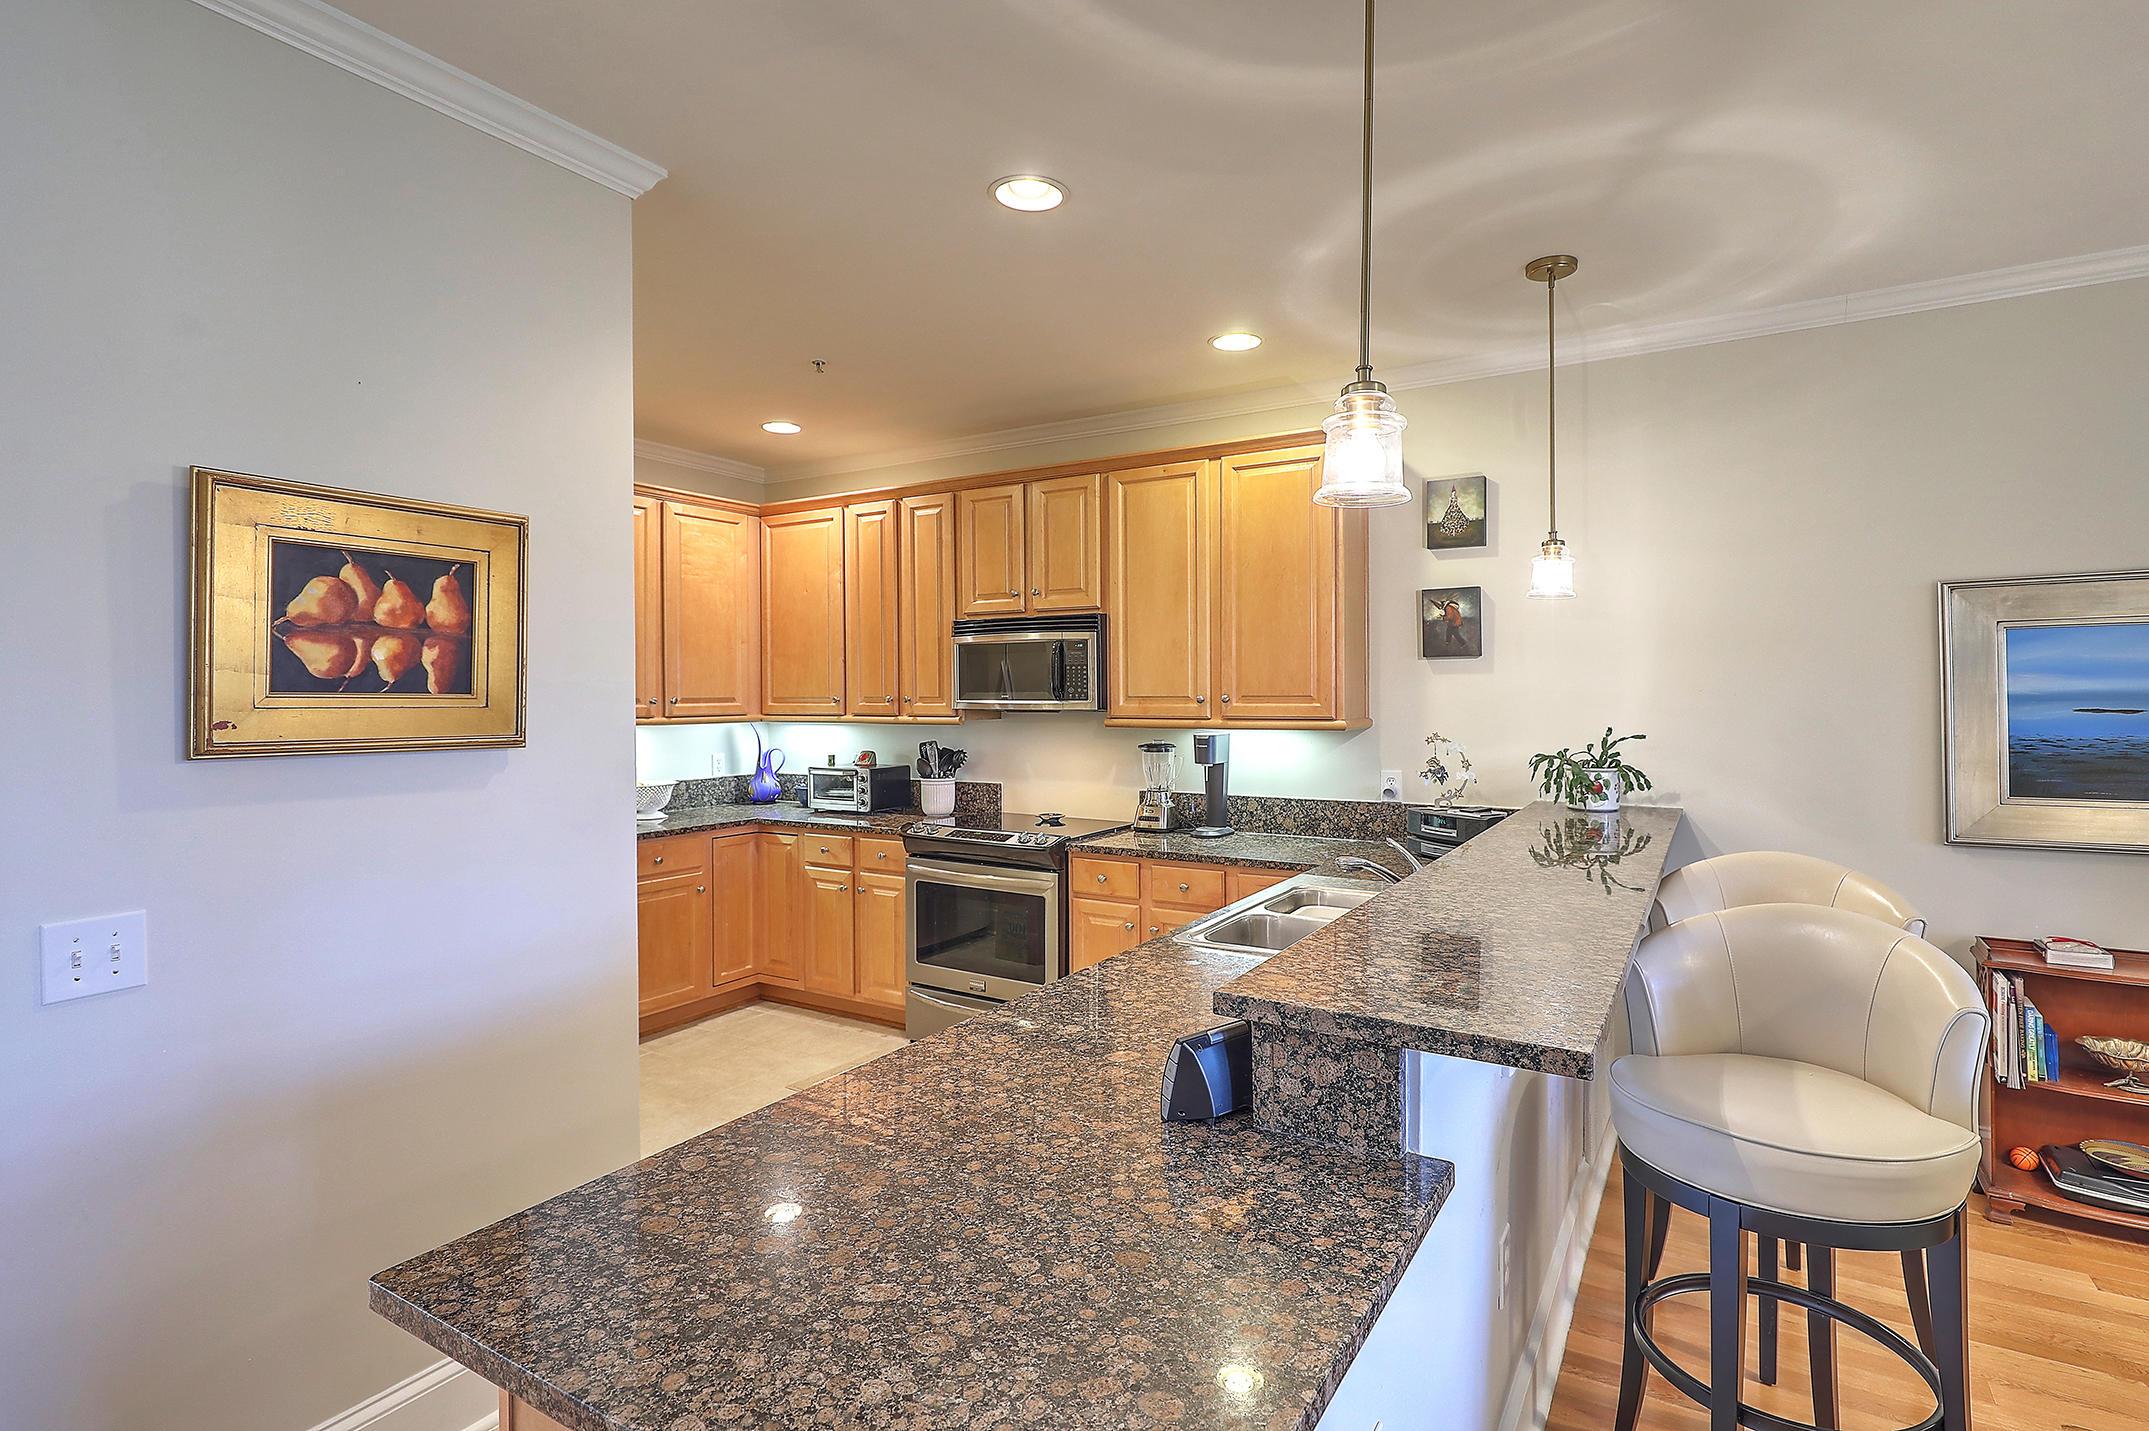 Etiwan Pointe Homes For Sale - 124 Winding Creek, Mount Pleasant, SC - 33